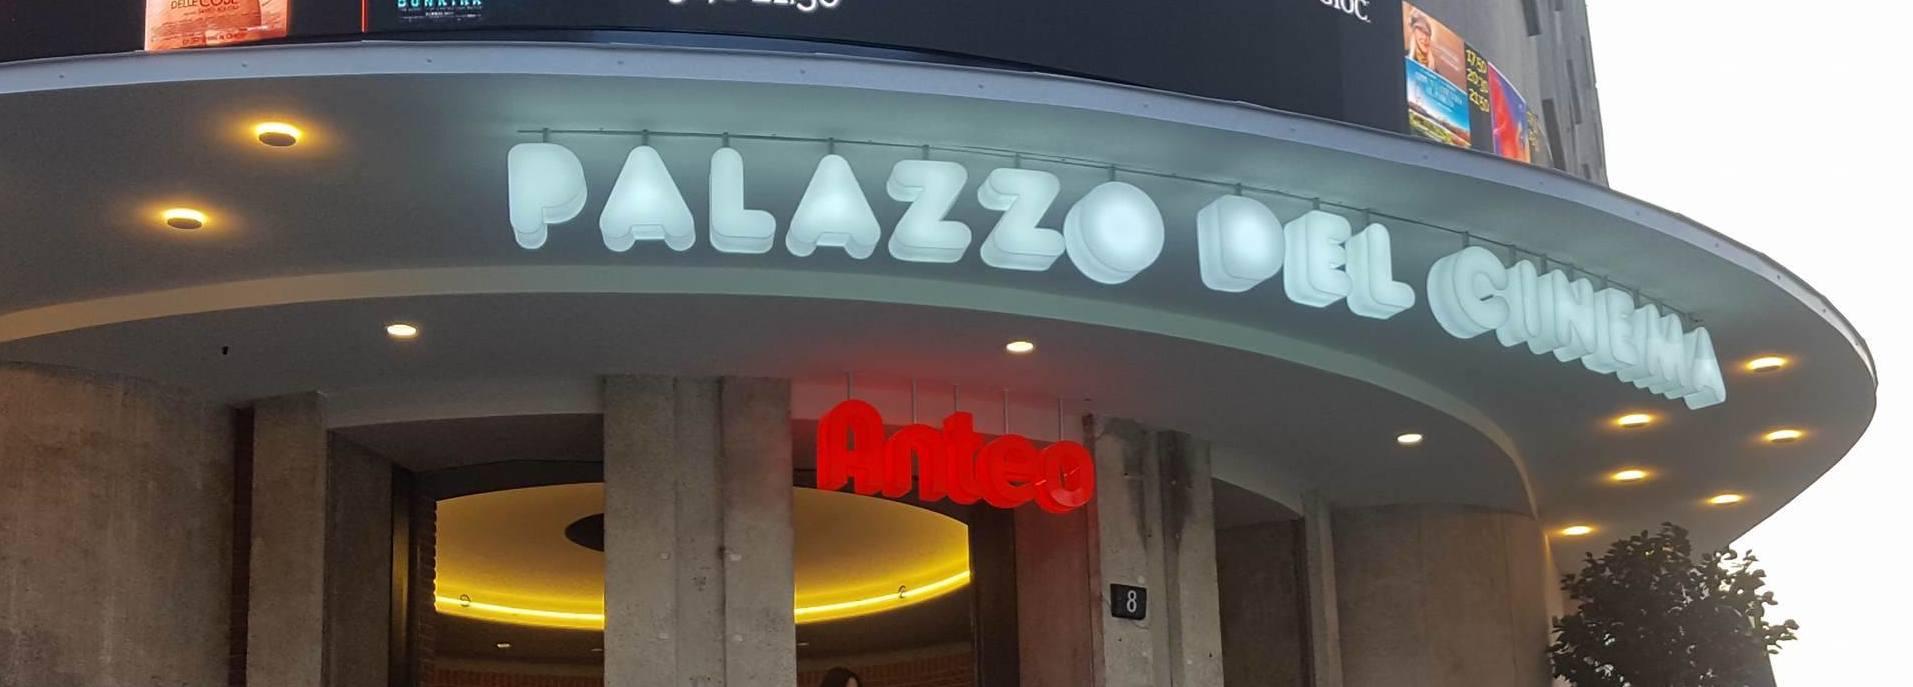 Palazzo_del_Cinema_testata